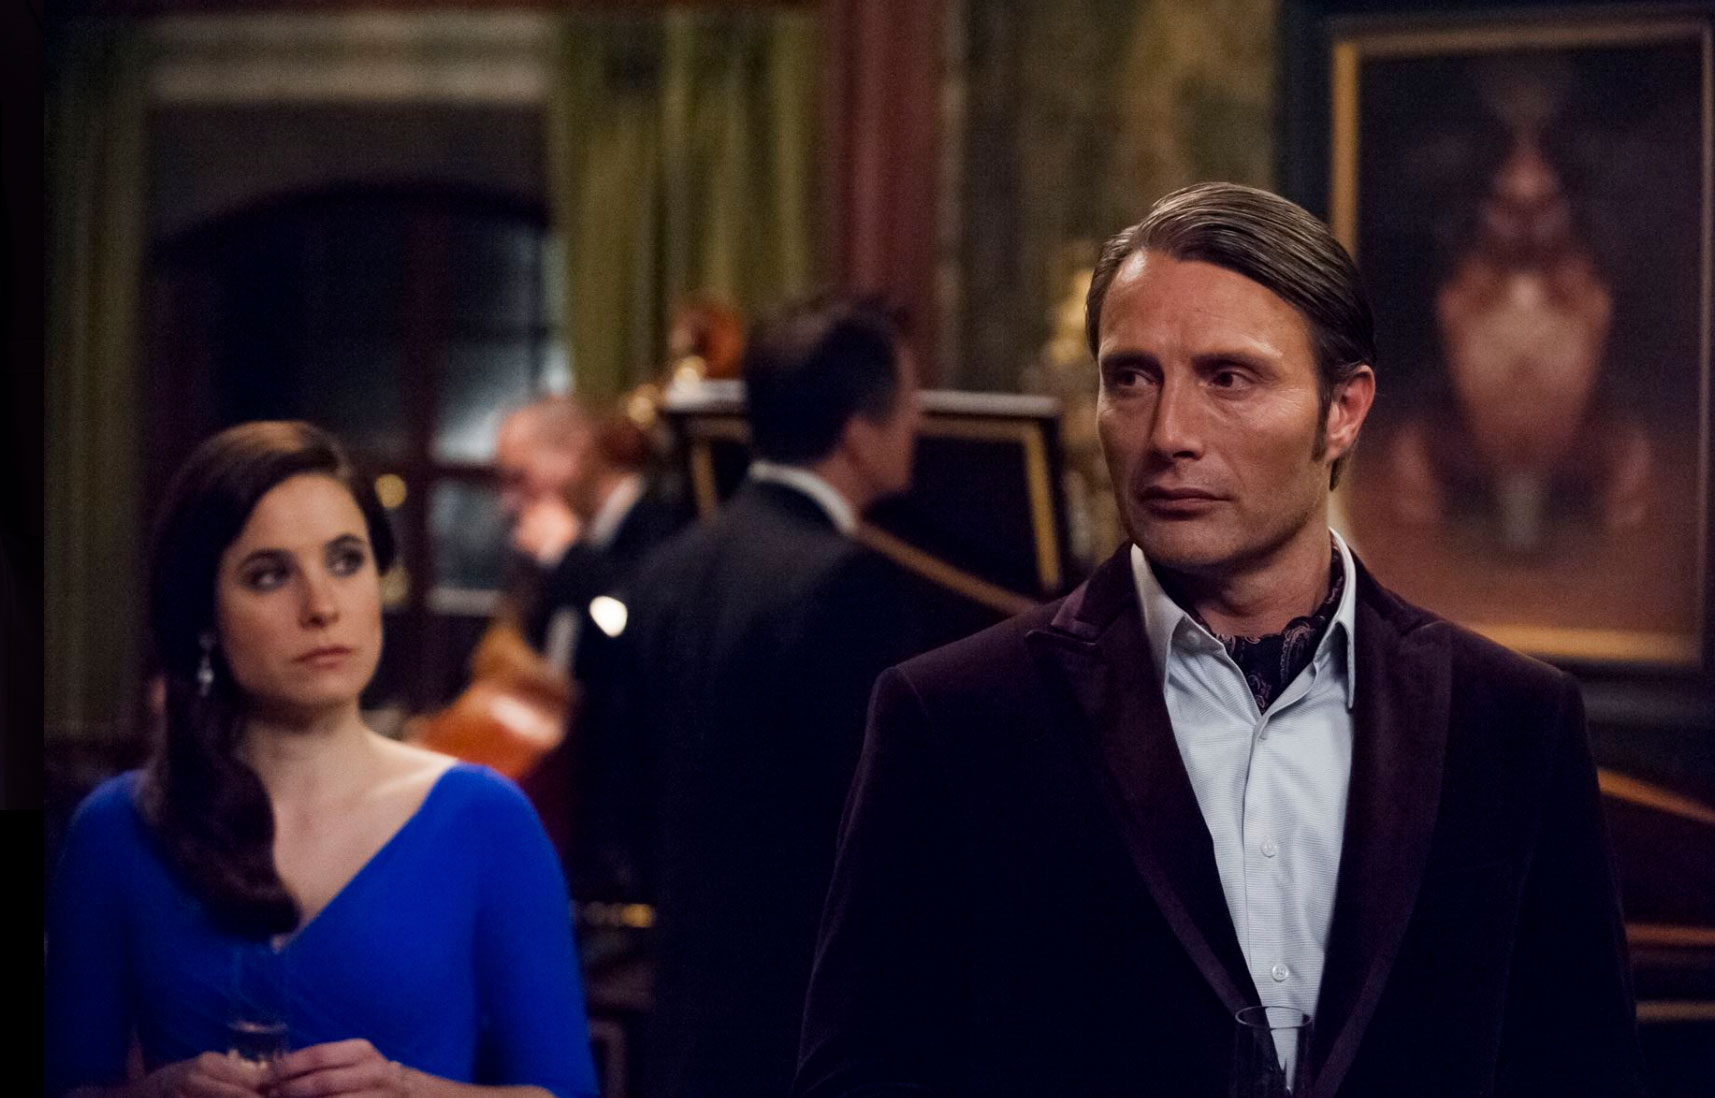 Hannibal in a velvet dinner jacket and Dr Alana Bloom